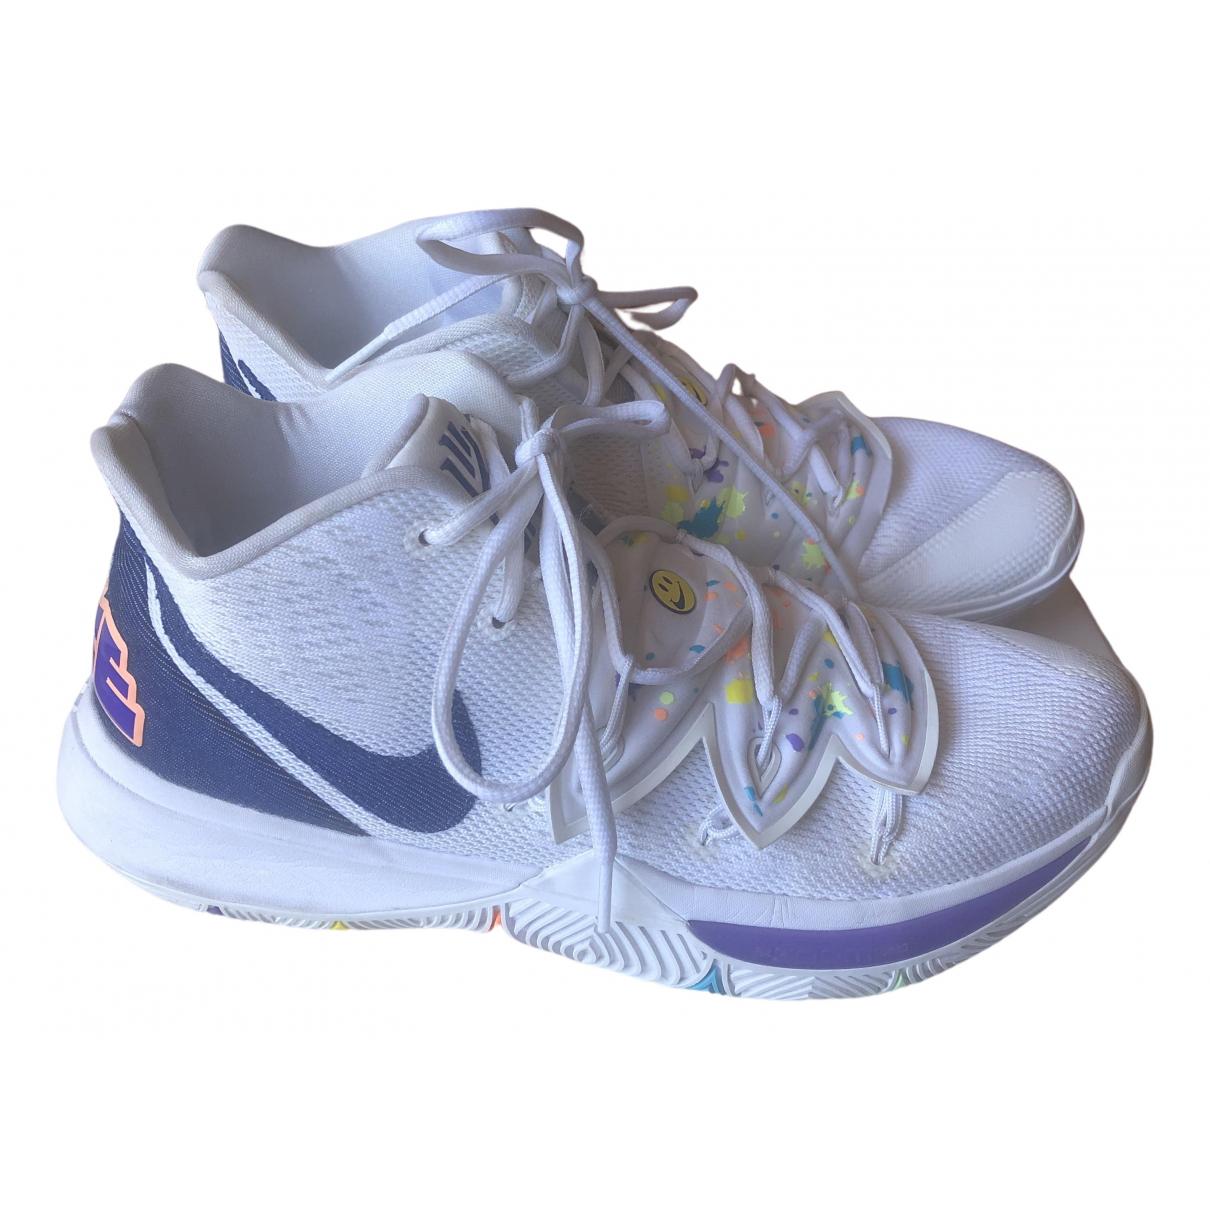 Nike Kyrie Sneakers in  Weiss Kautschuk